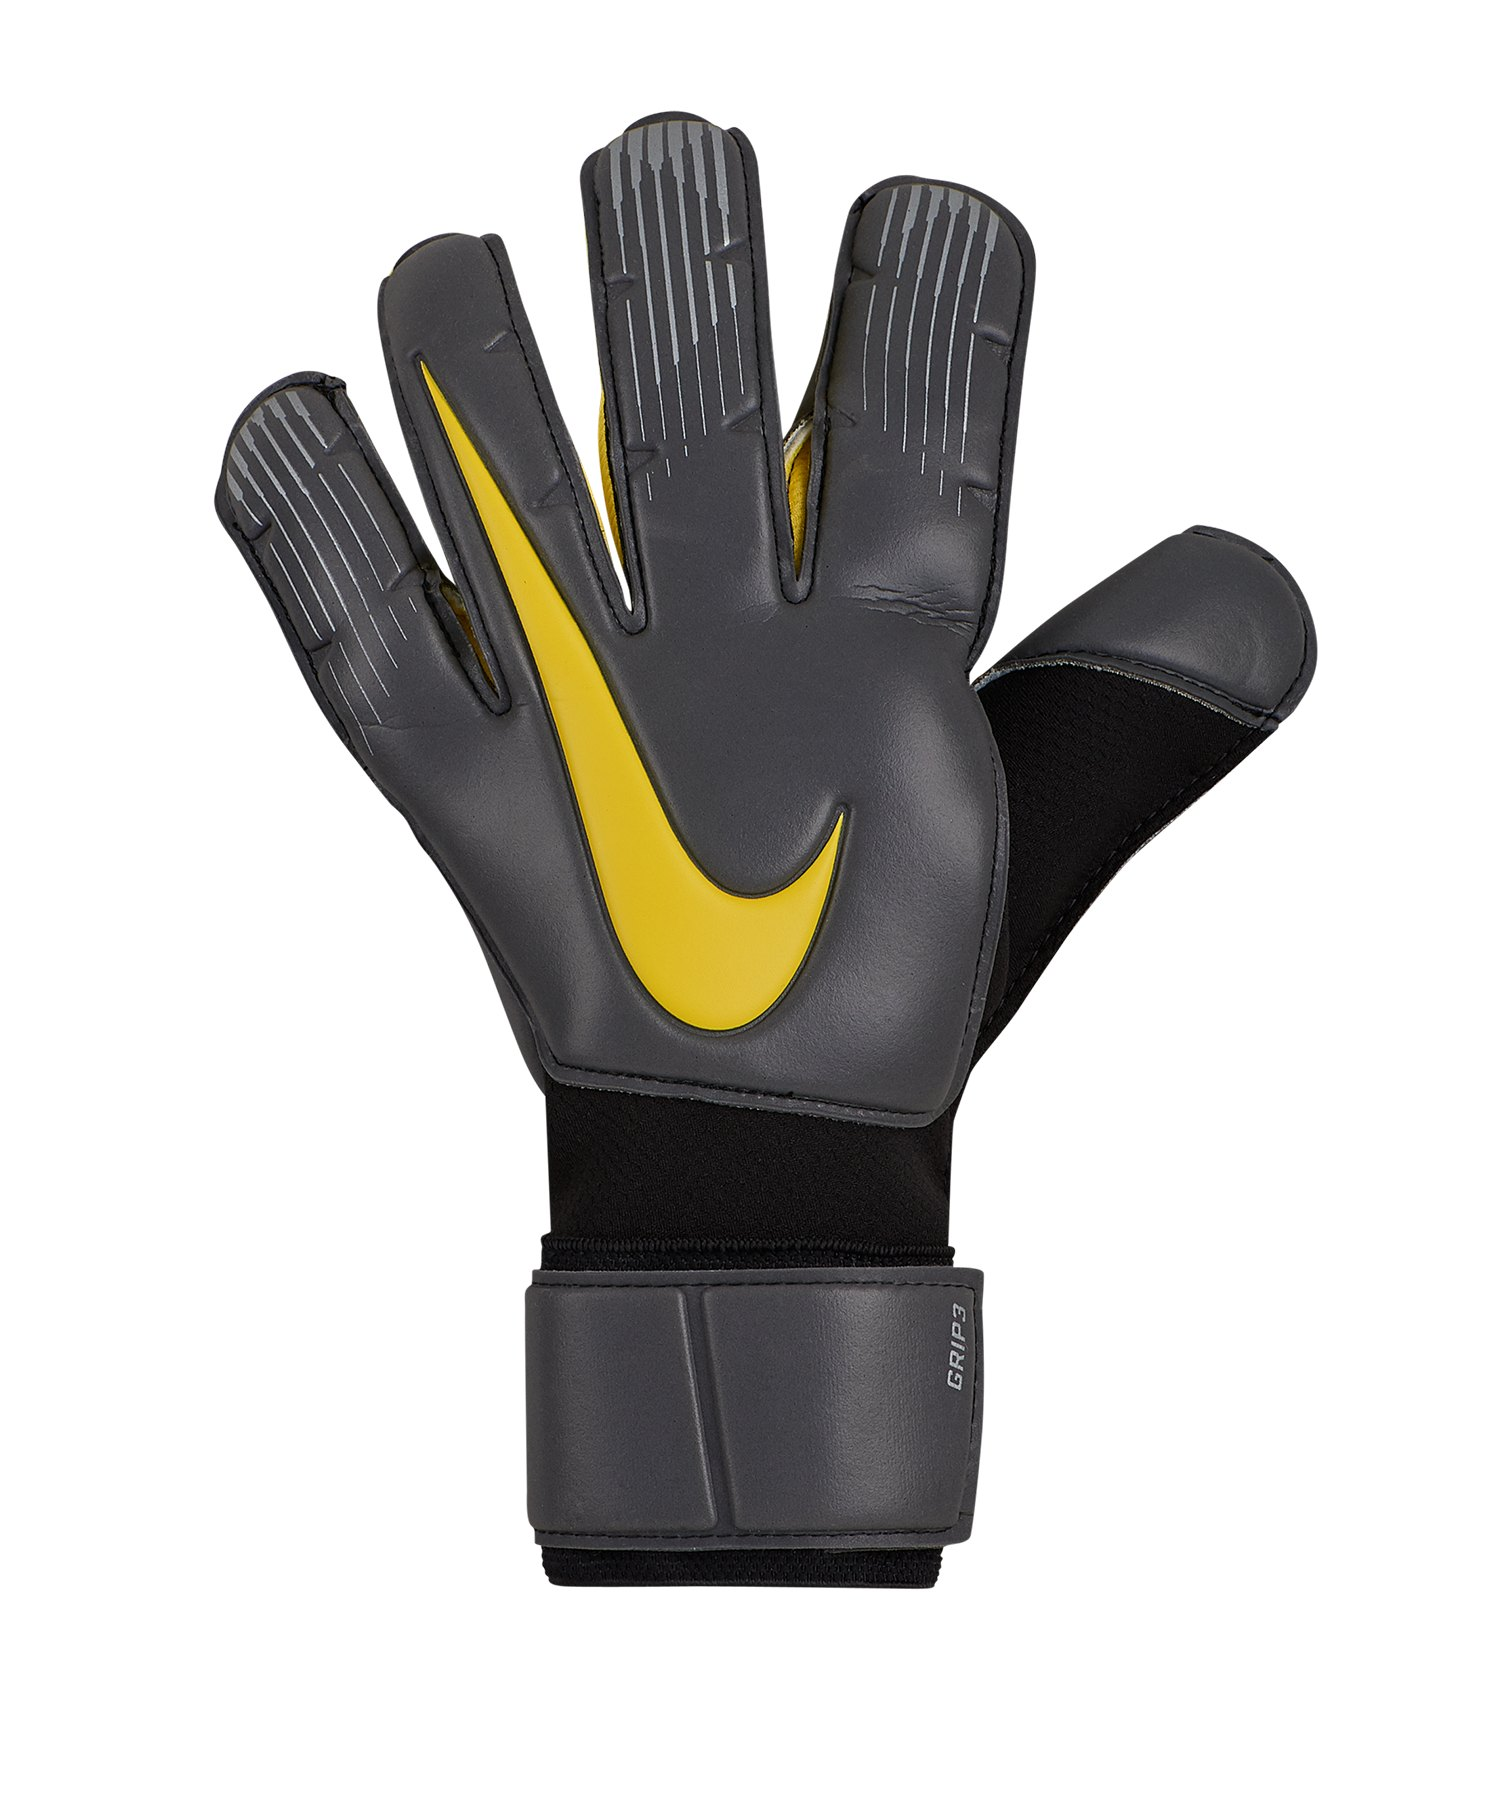 Nike Grip 3 Torwarthandschuhe Grau F060 - grau